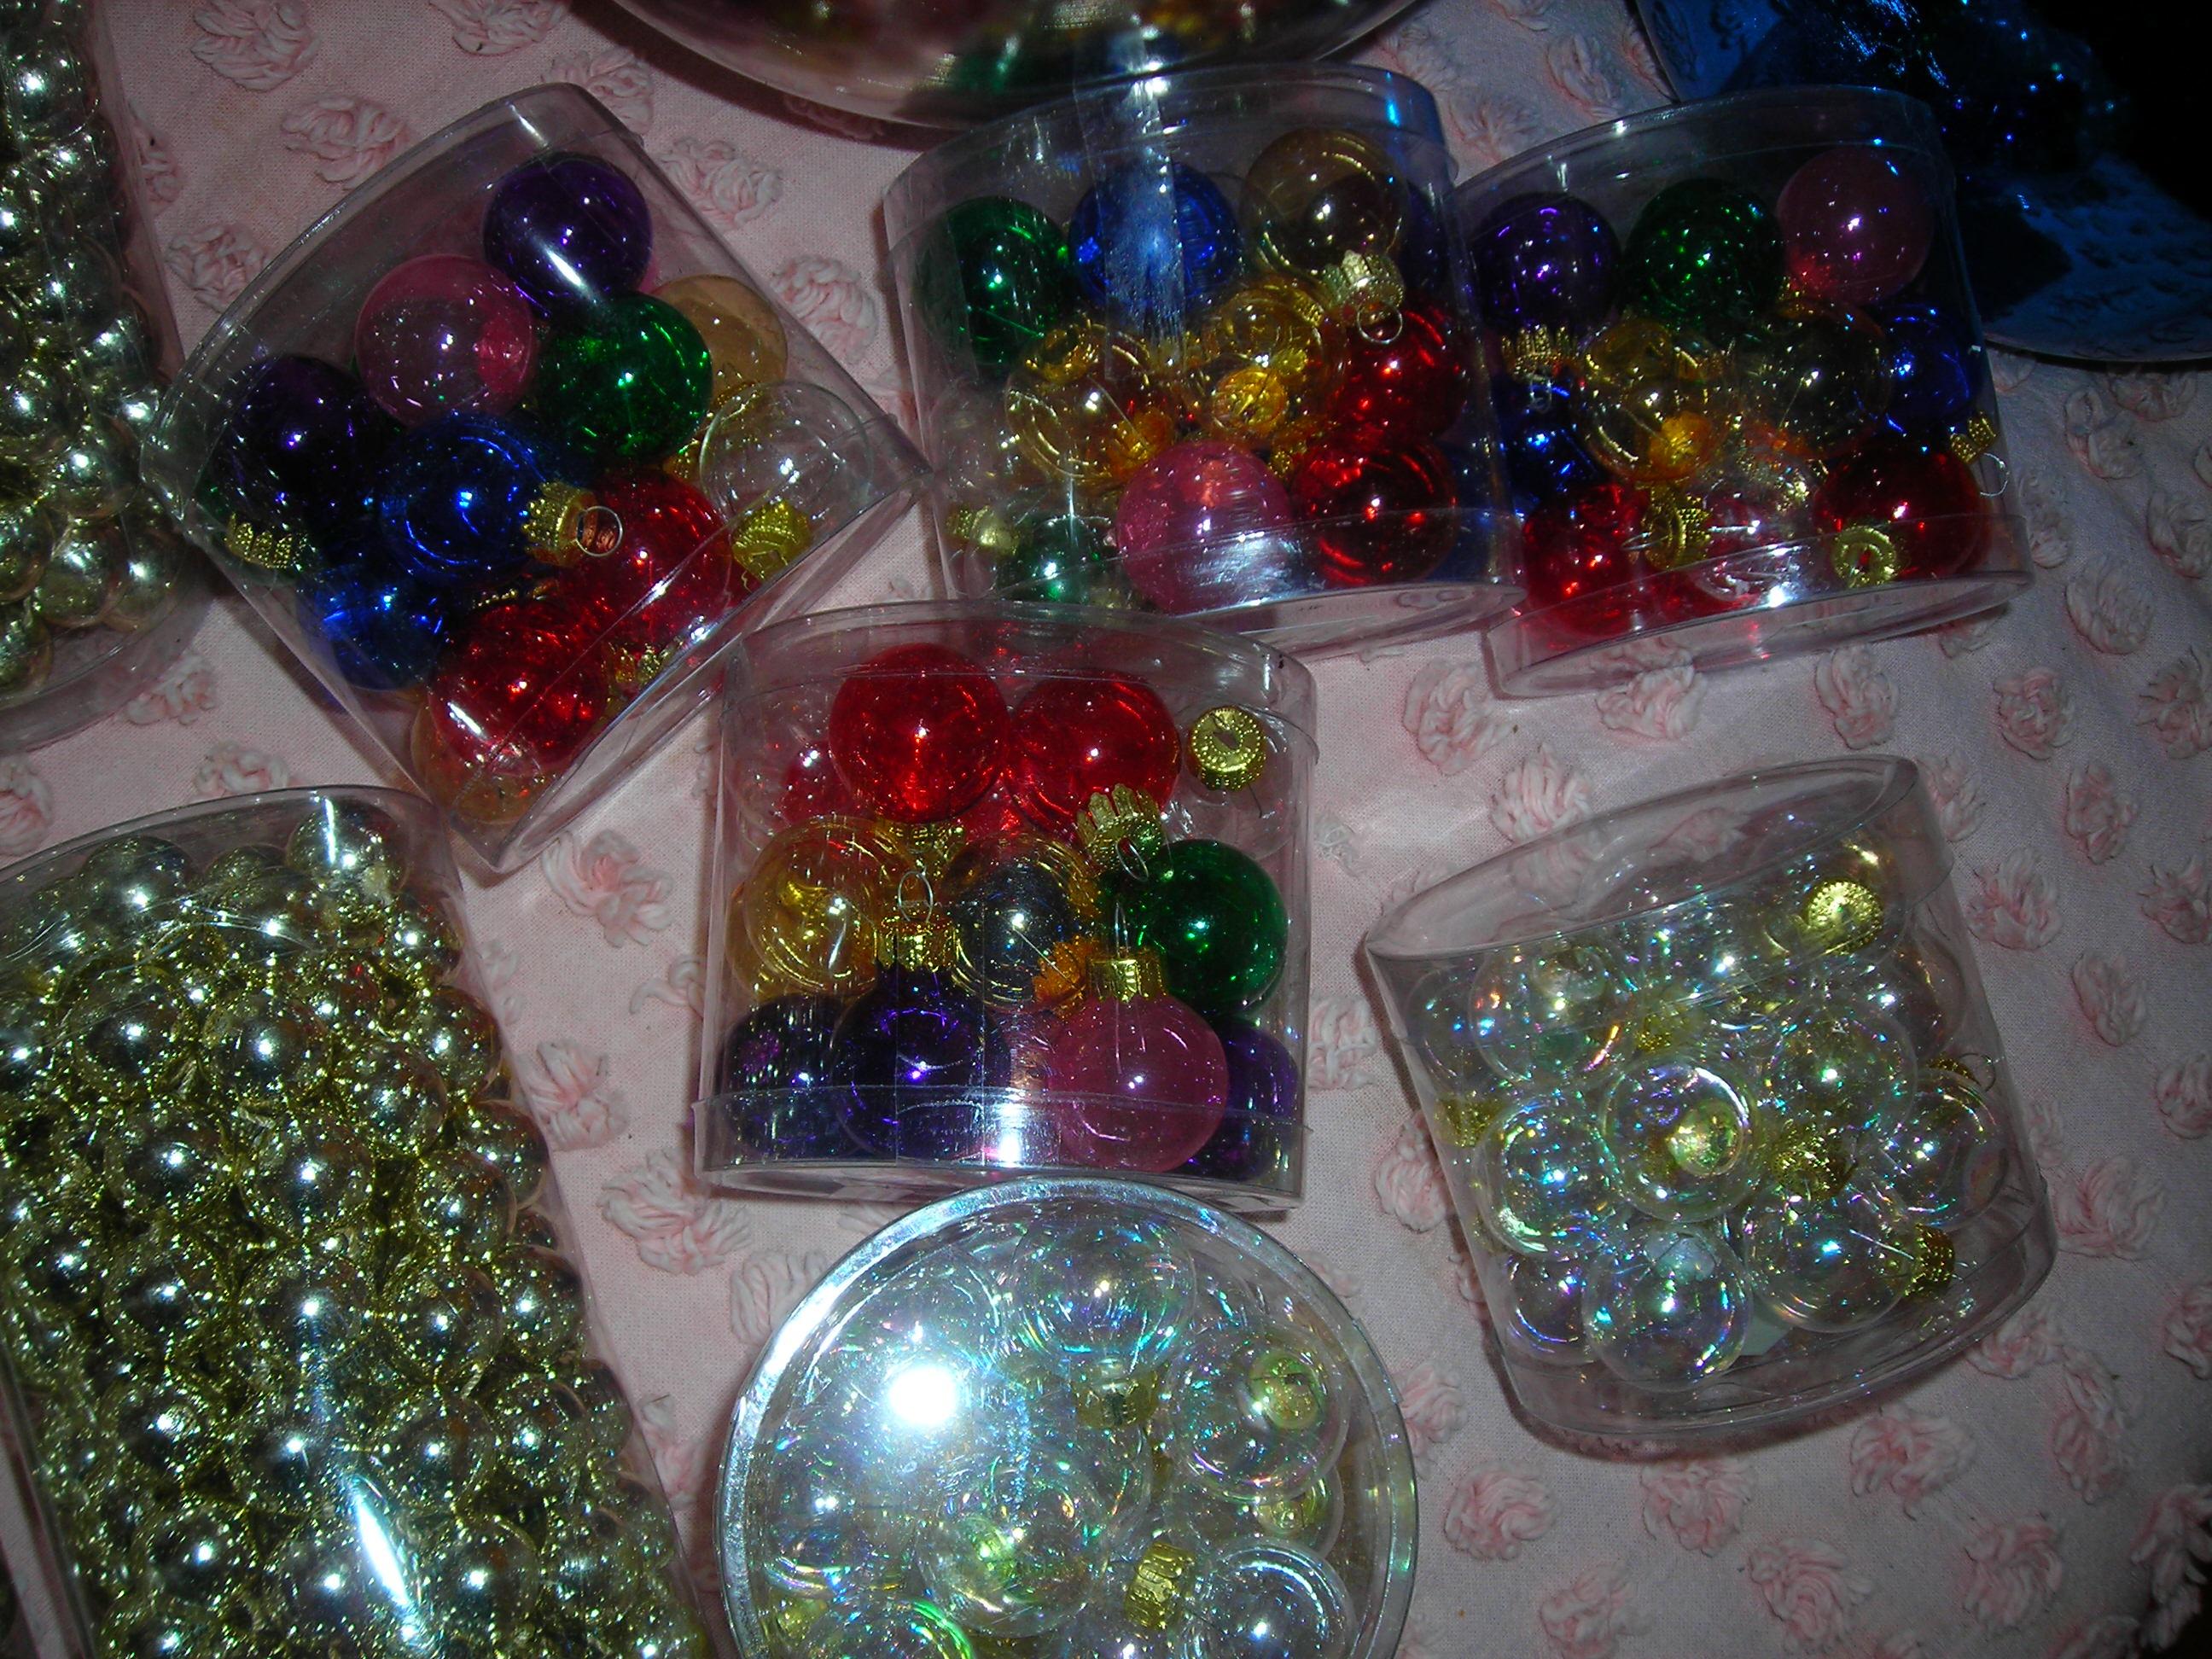 adorable miniature ornaments, different colors and clear ... just imagine the possibilities, esp at 20 cents per pkg!!